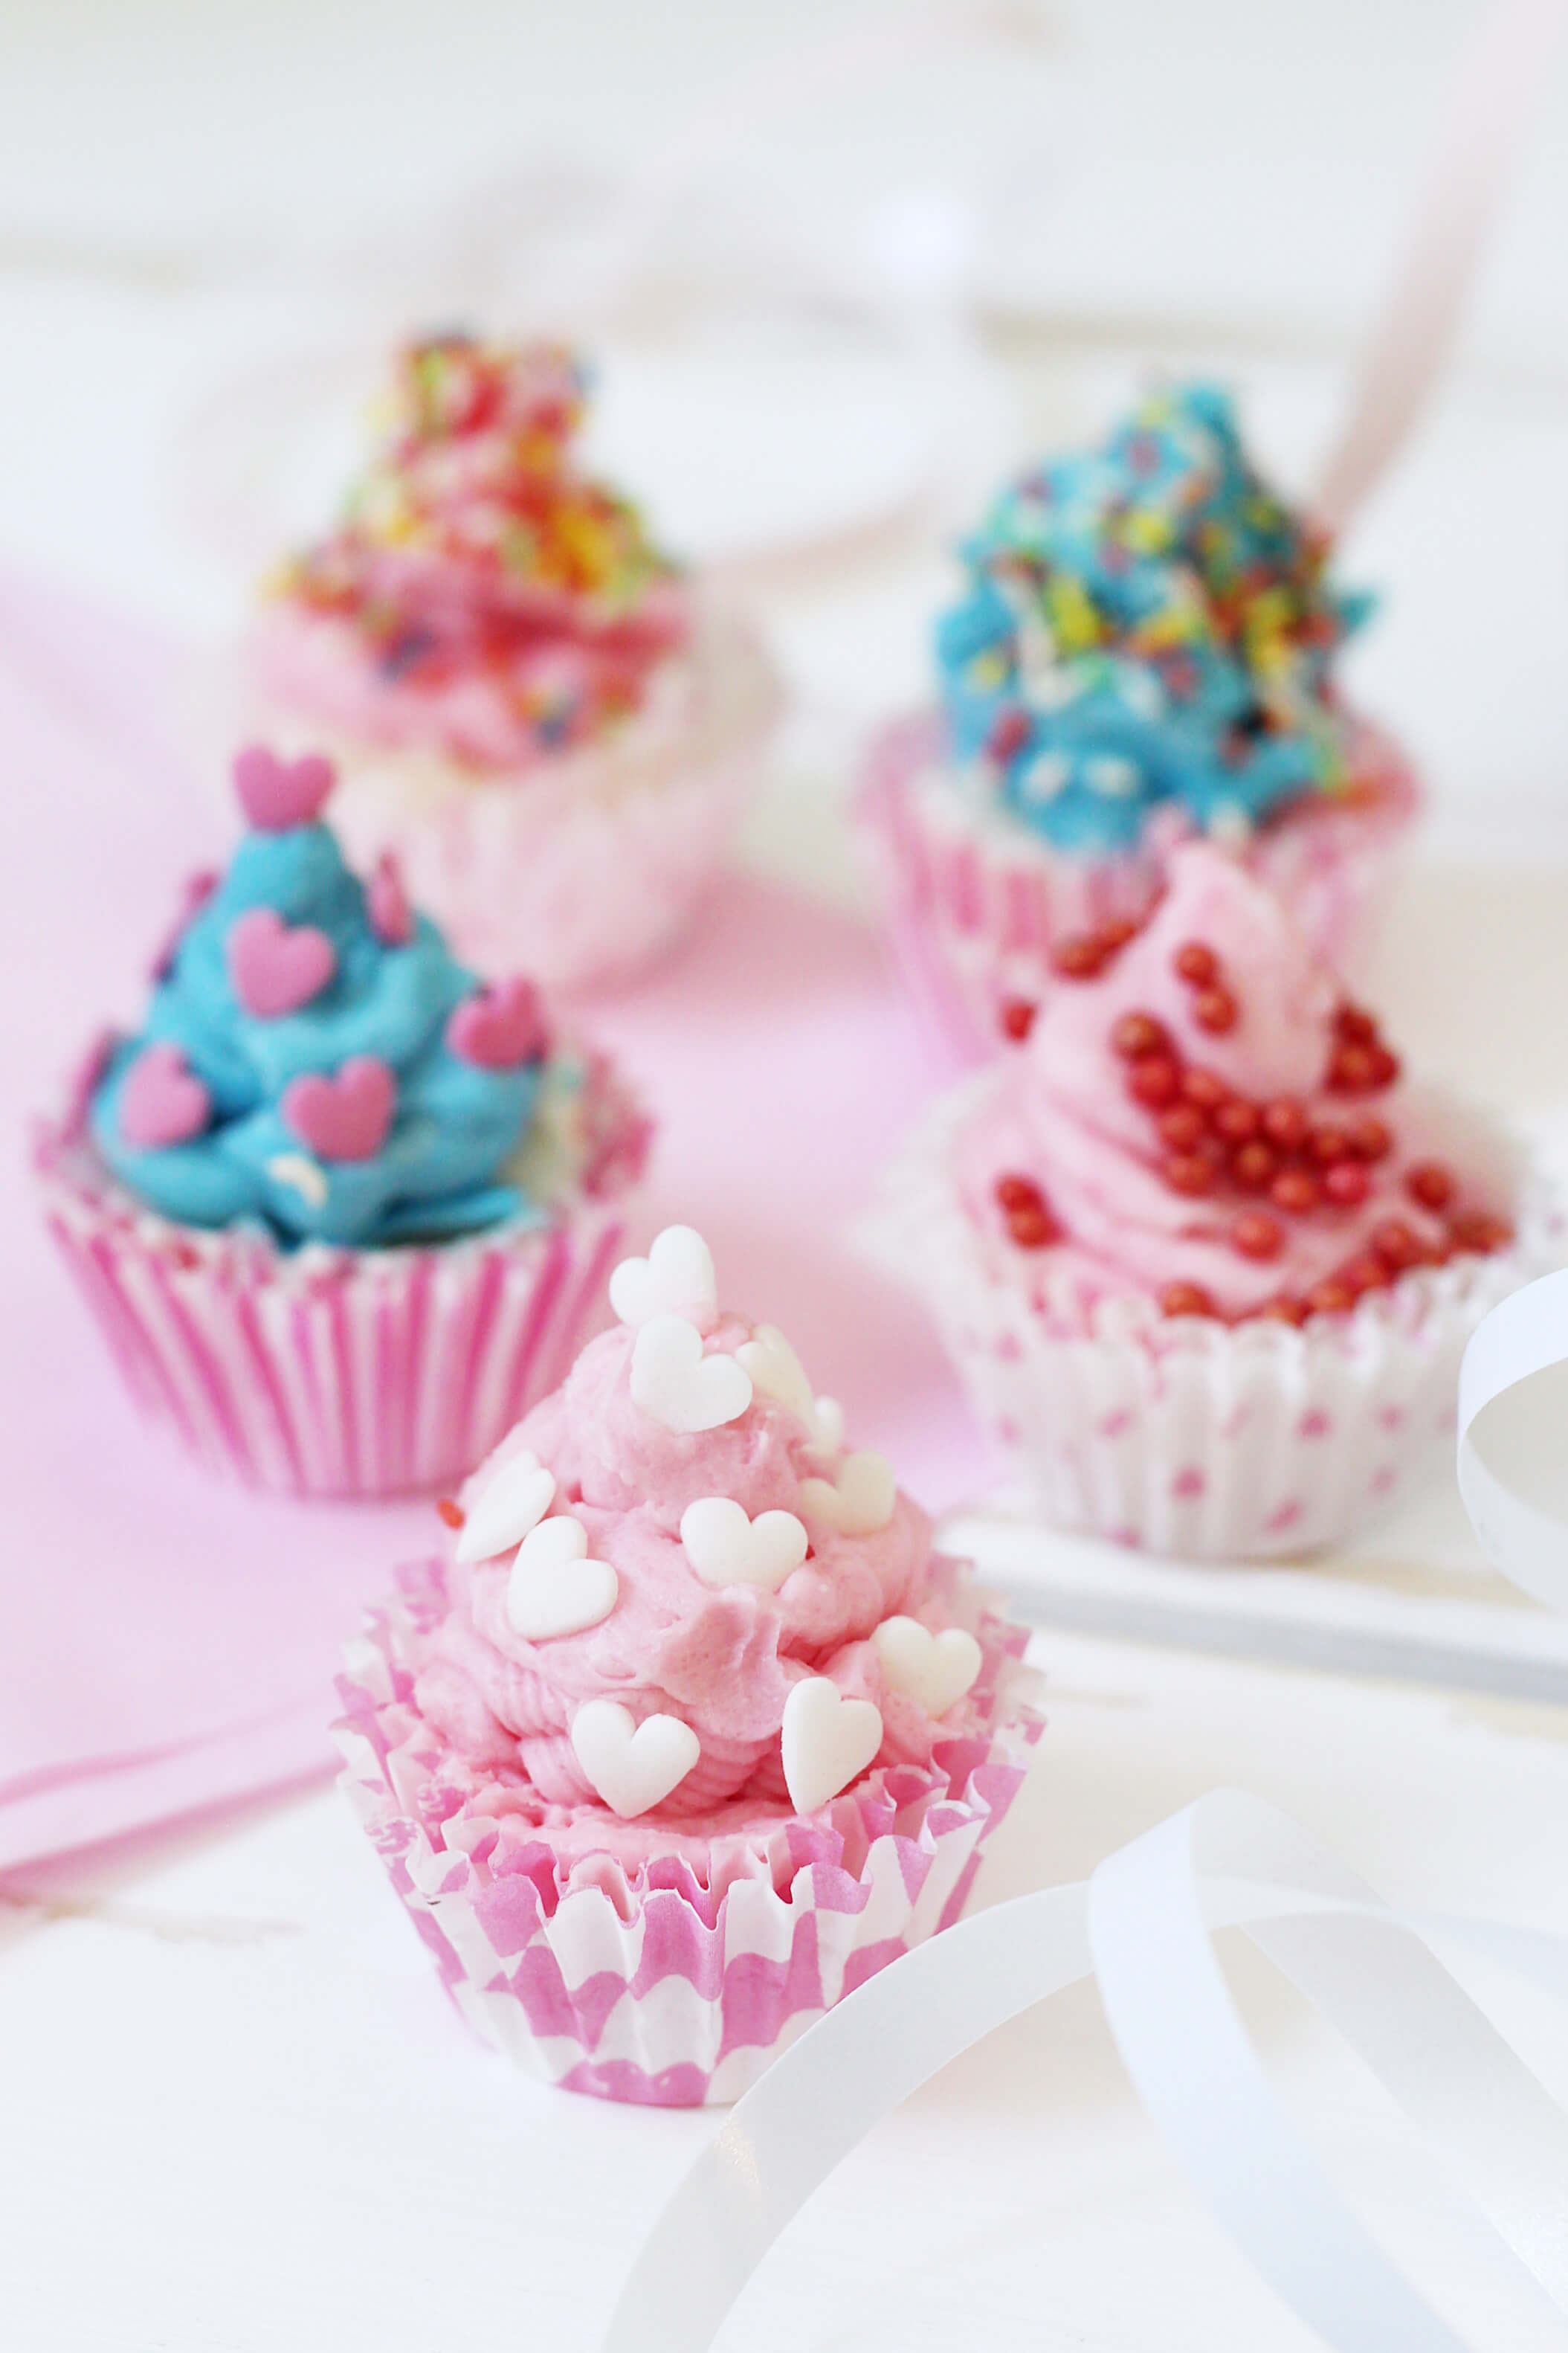 DIY-Geschenke-Weihnachten-bade-kugeln-cupcakes-selbermachen-rezept-diy-blog